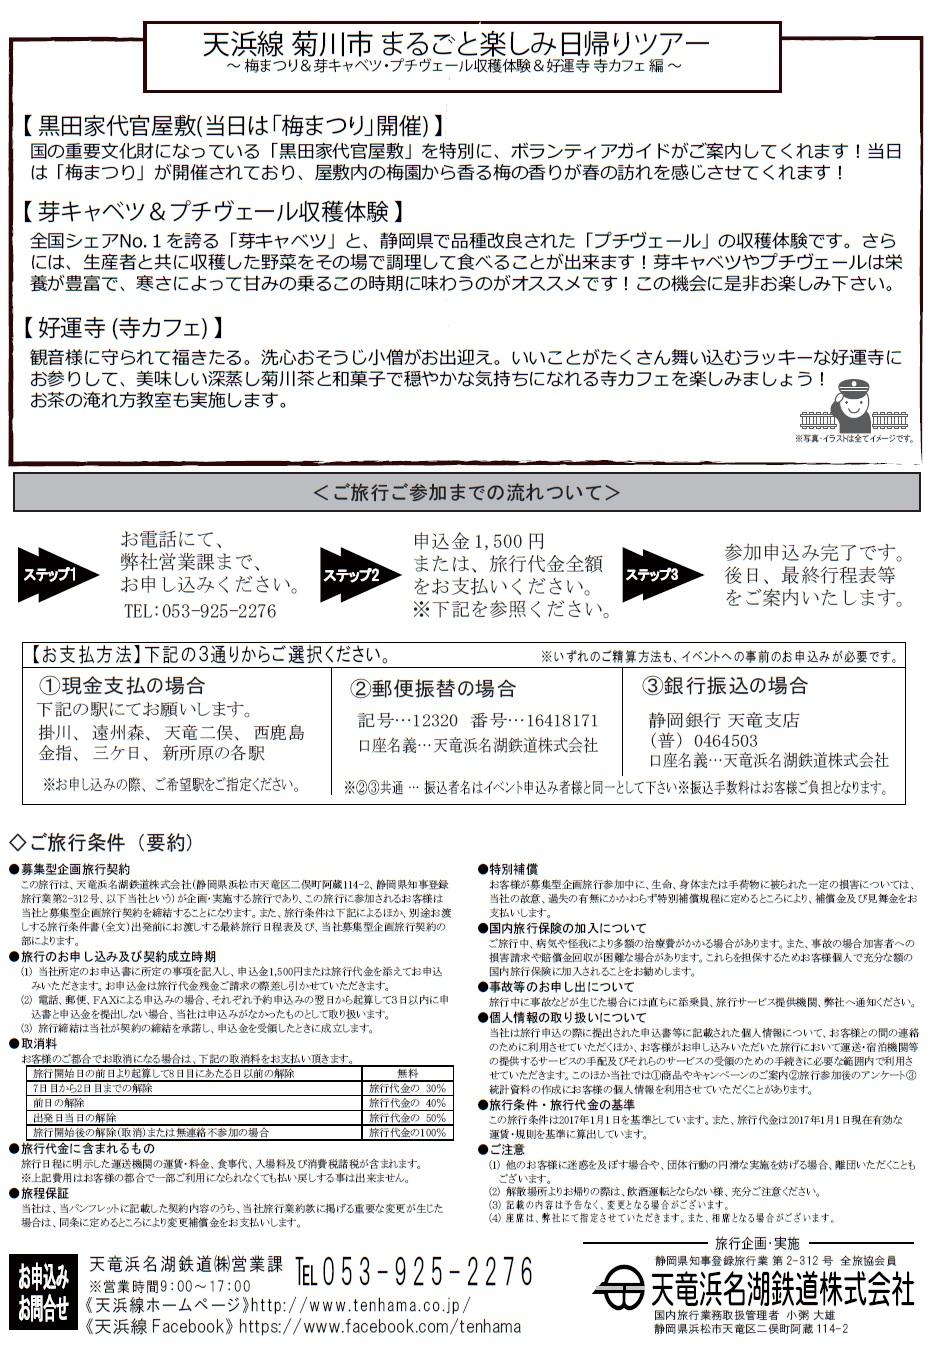 kikugawaevent20190209ura